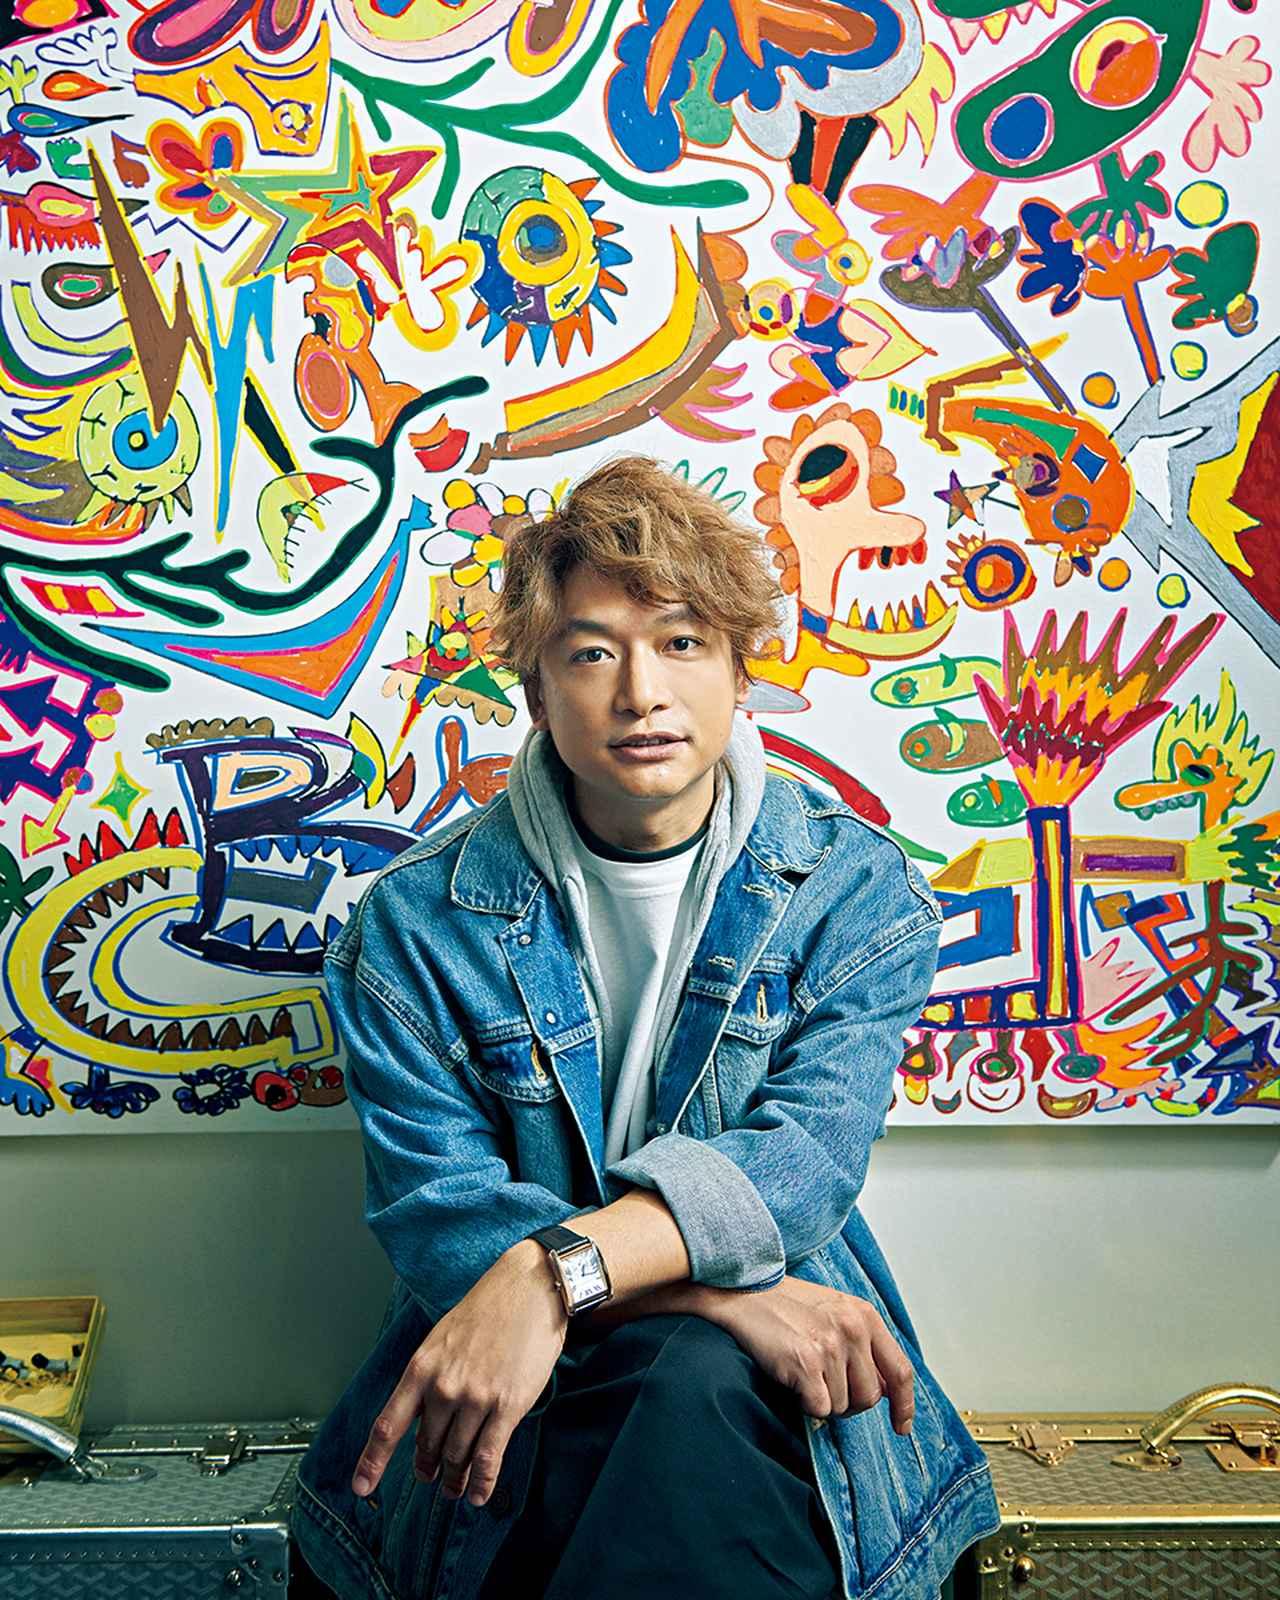 Images : 6番目の画像 - 「香取慎吾のアトリエ<後編>」のアルバム - T JAPAN:The New York Times Style Magazine 公式サイト